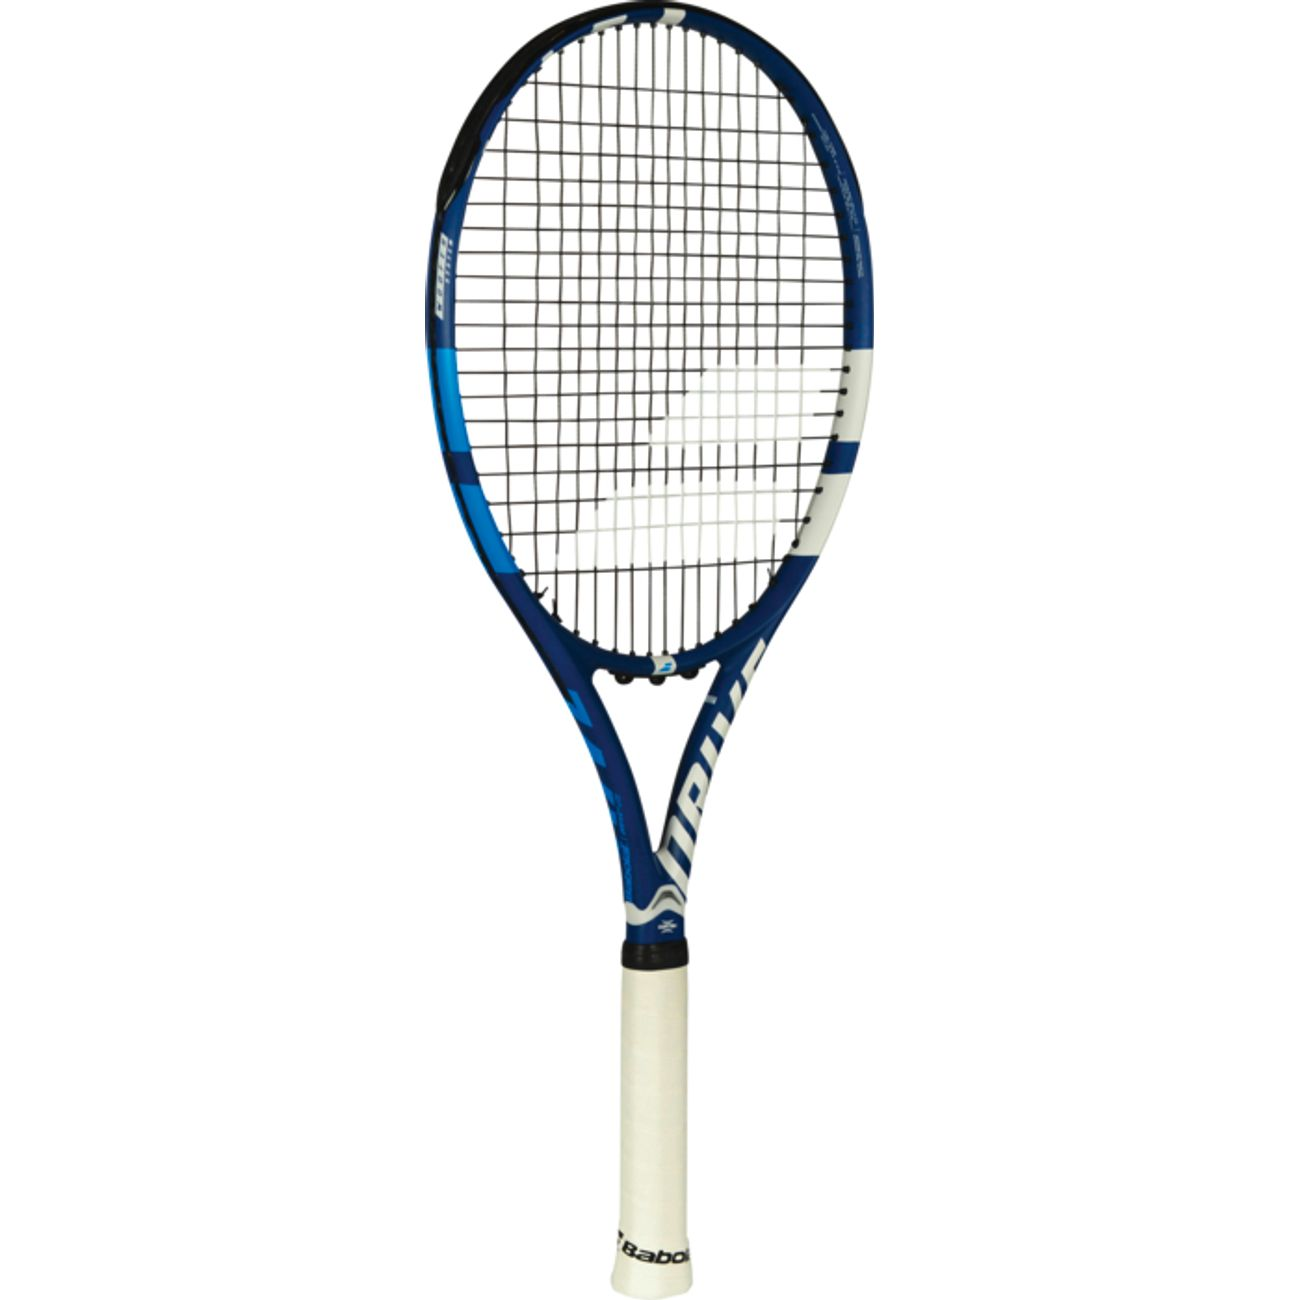 RAQUETTE Tennis adulte BABOLAT DRIVE G LITE